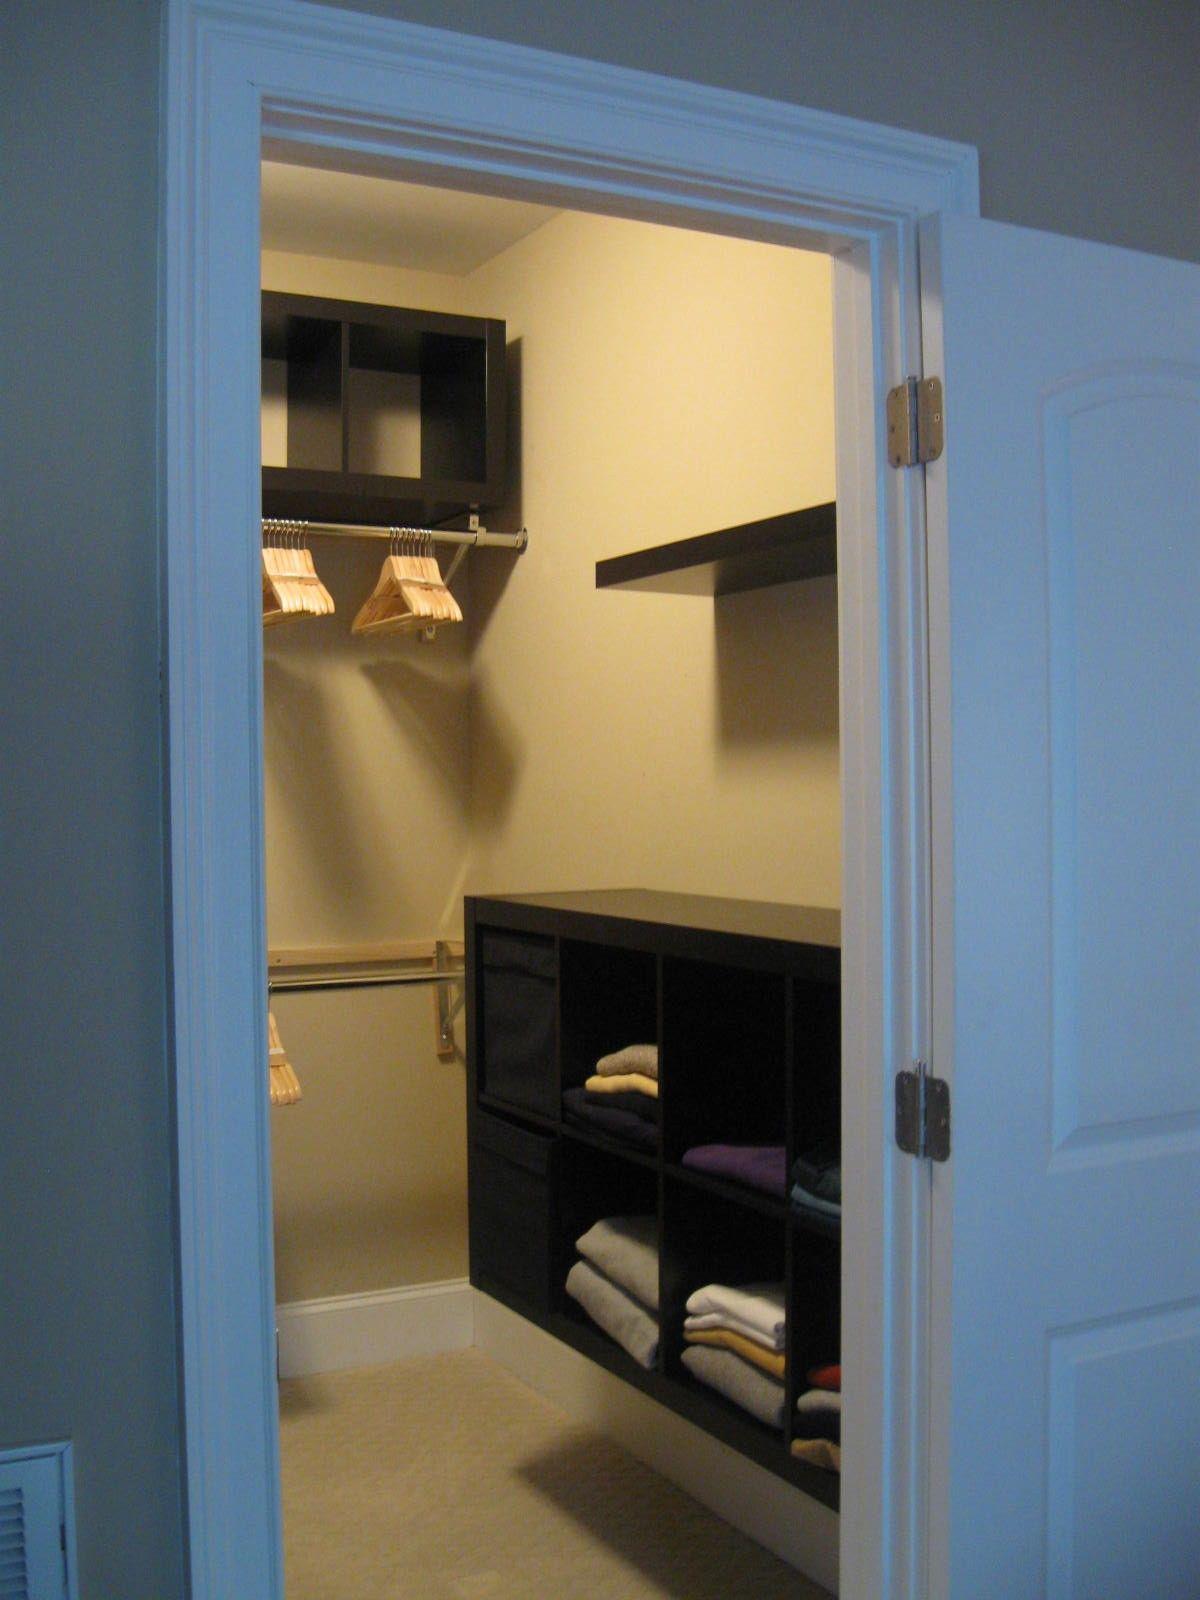 Bedroom Closet Design Ideas 12 Small Walk In Closet Ideas And Organizer Designs  Storage Room